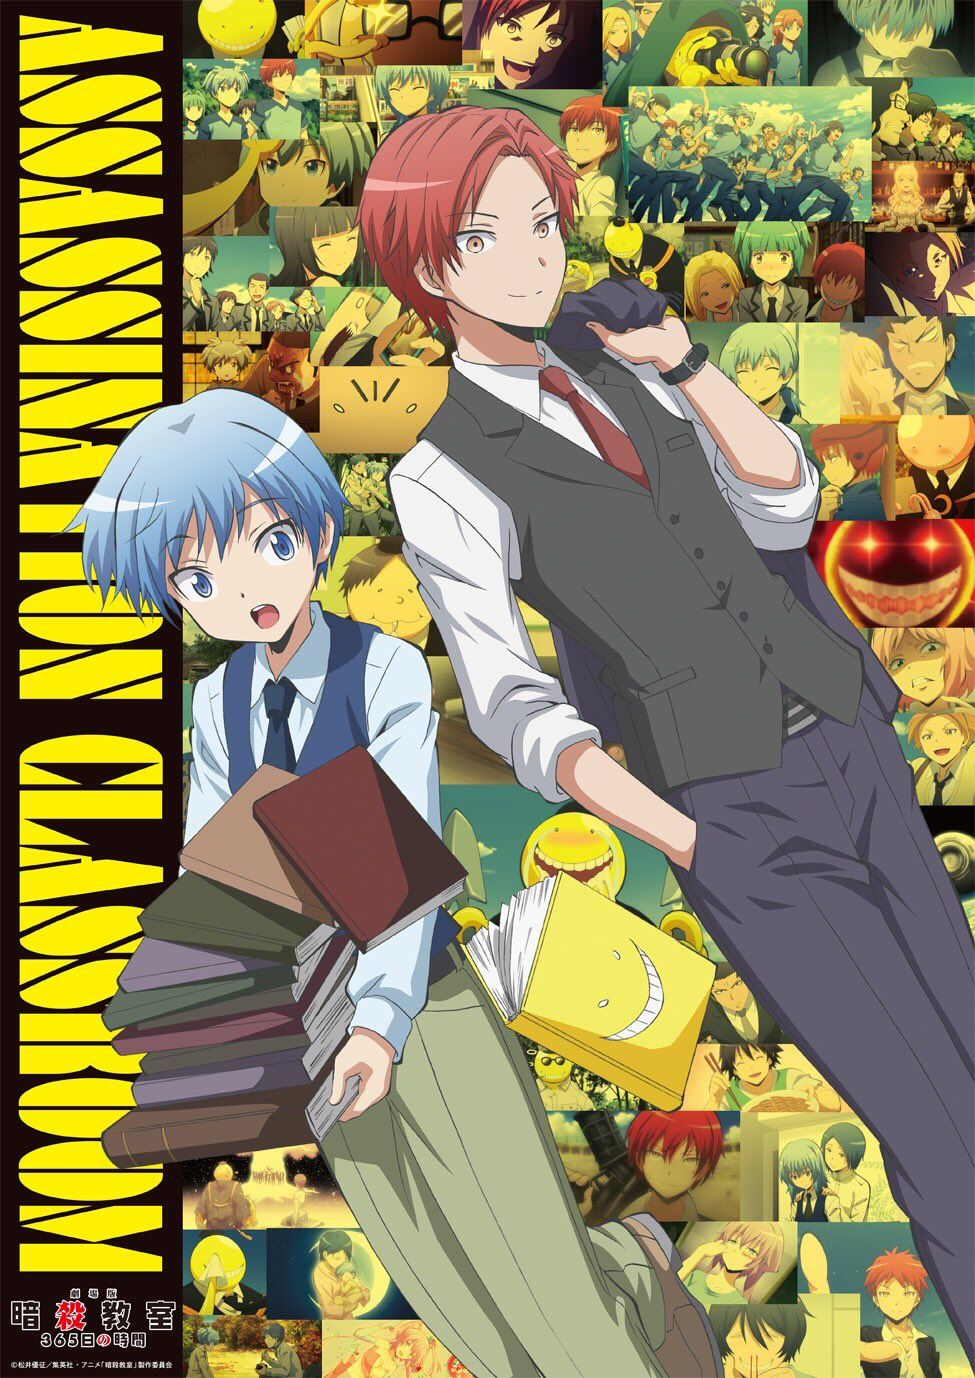 Nuevo Poster Promocional De La Pelicula Ansatsu Kyoushitsu 365 Hi No Jikan Assassination Classroom Assasination Classroom Anime Shows